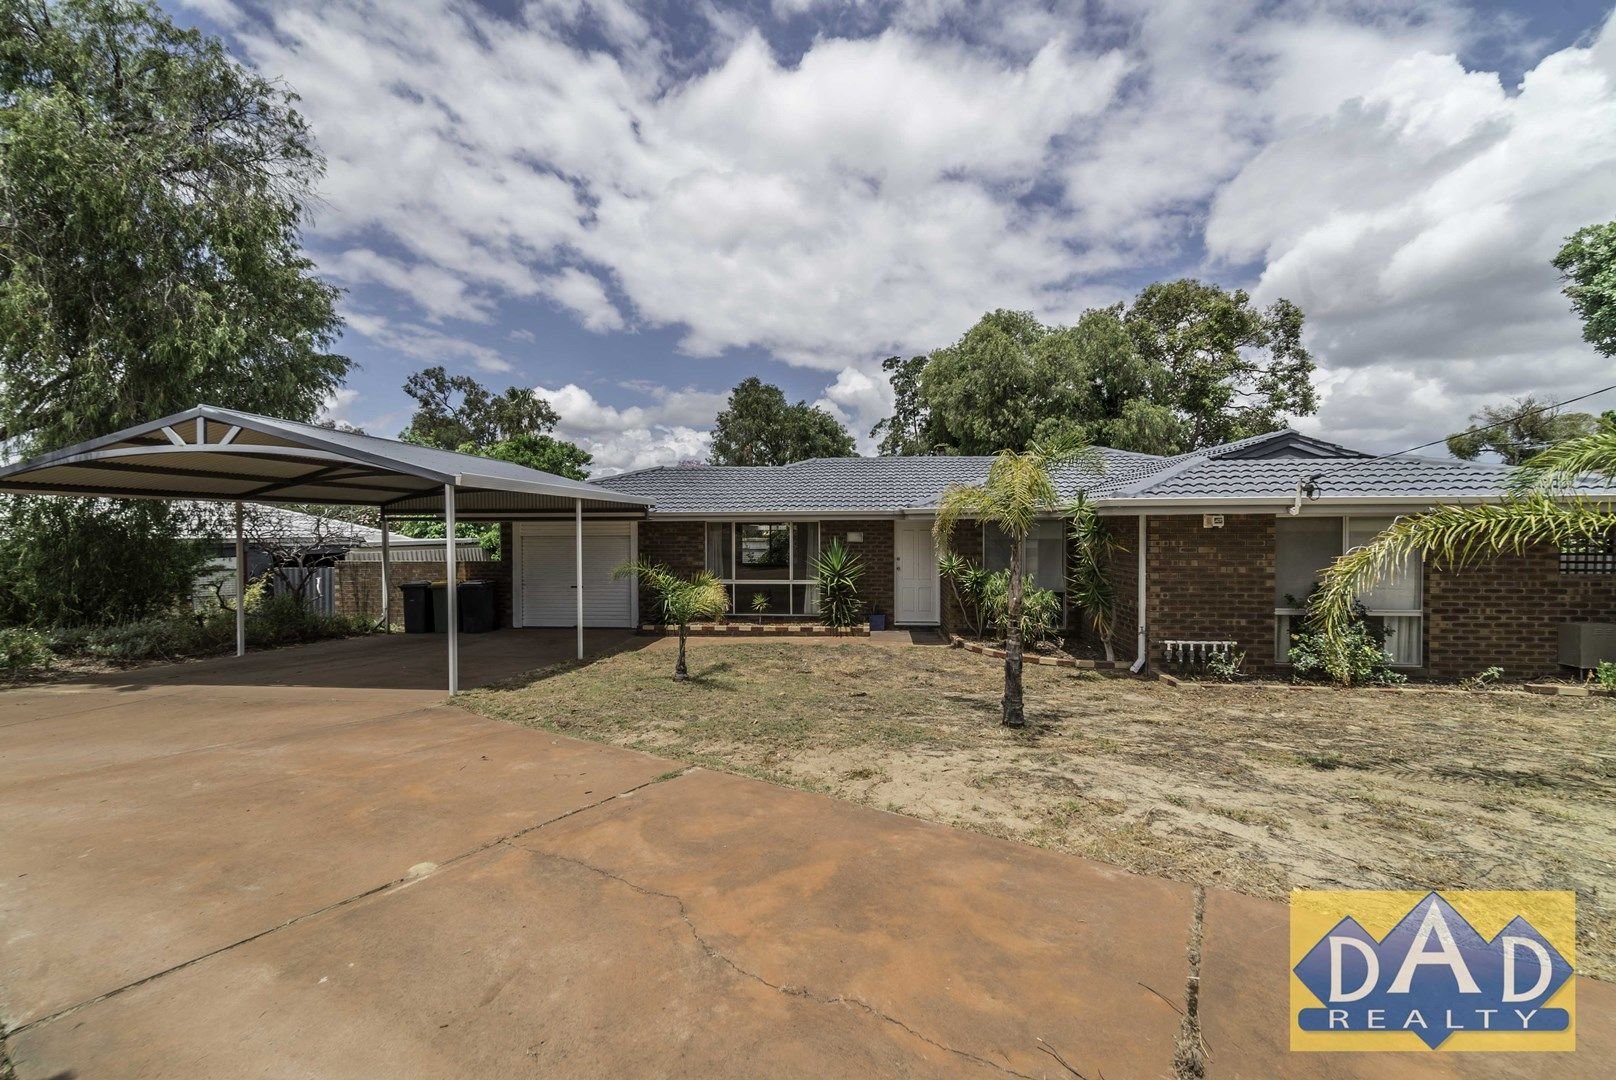 113 Lucy Victoria Avenue, Australind WA 6233, Image 0